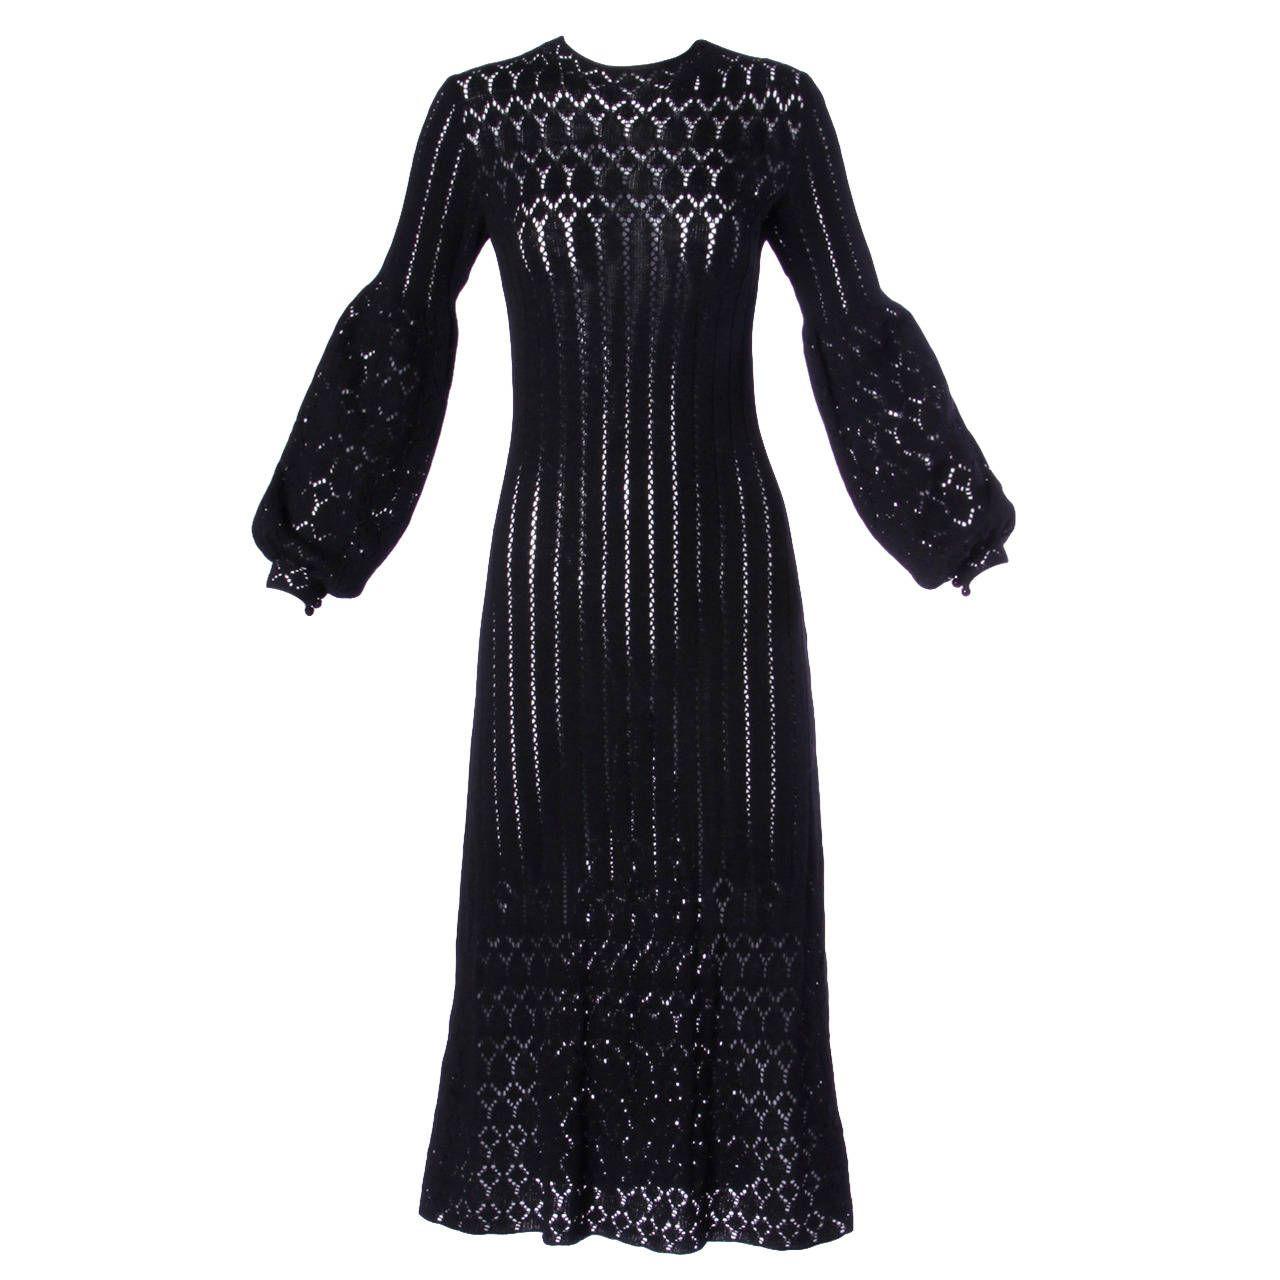 Adolfo Vintage 1970s 70s Black Crochet Lace Sheer Knit Dress Dresses Black Crochet Lace Fashion [ 1280 x 1280 Pixel ]